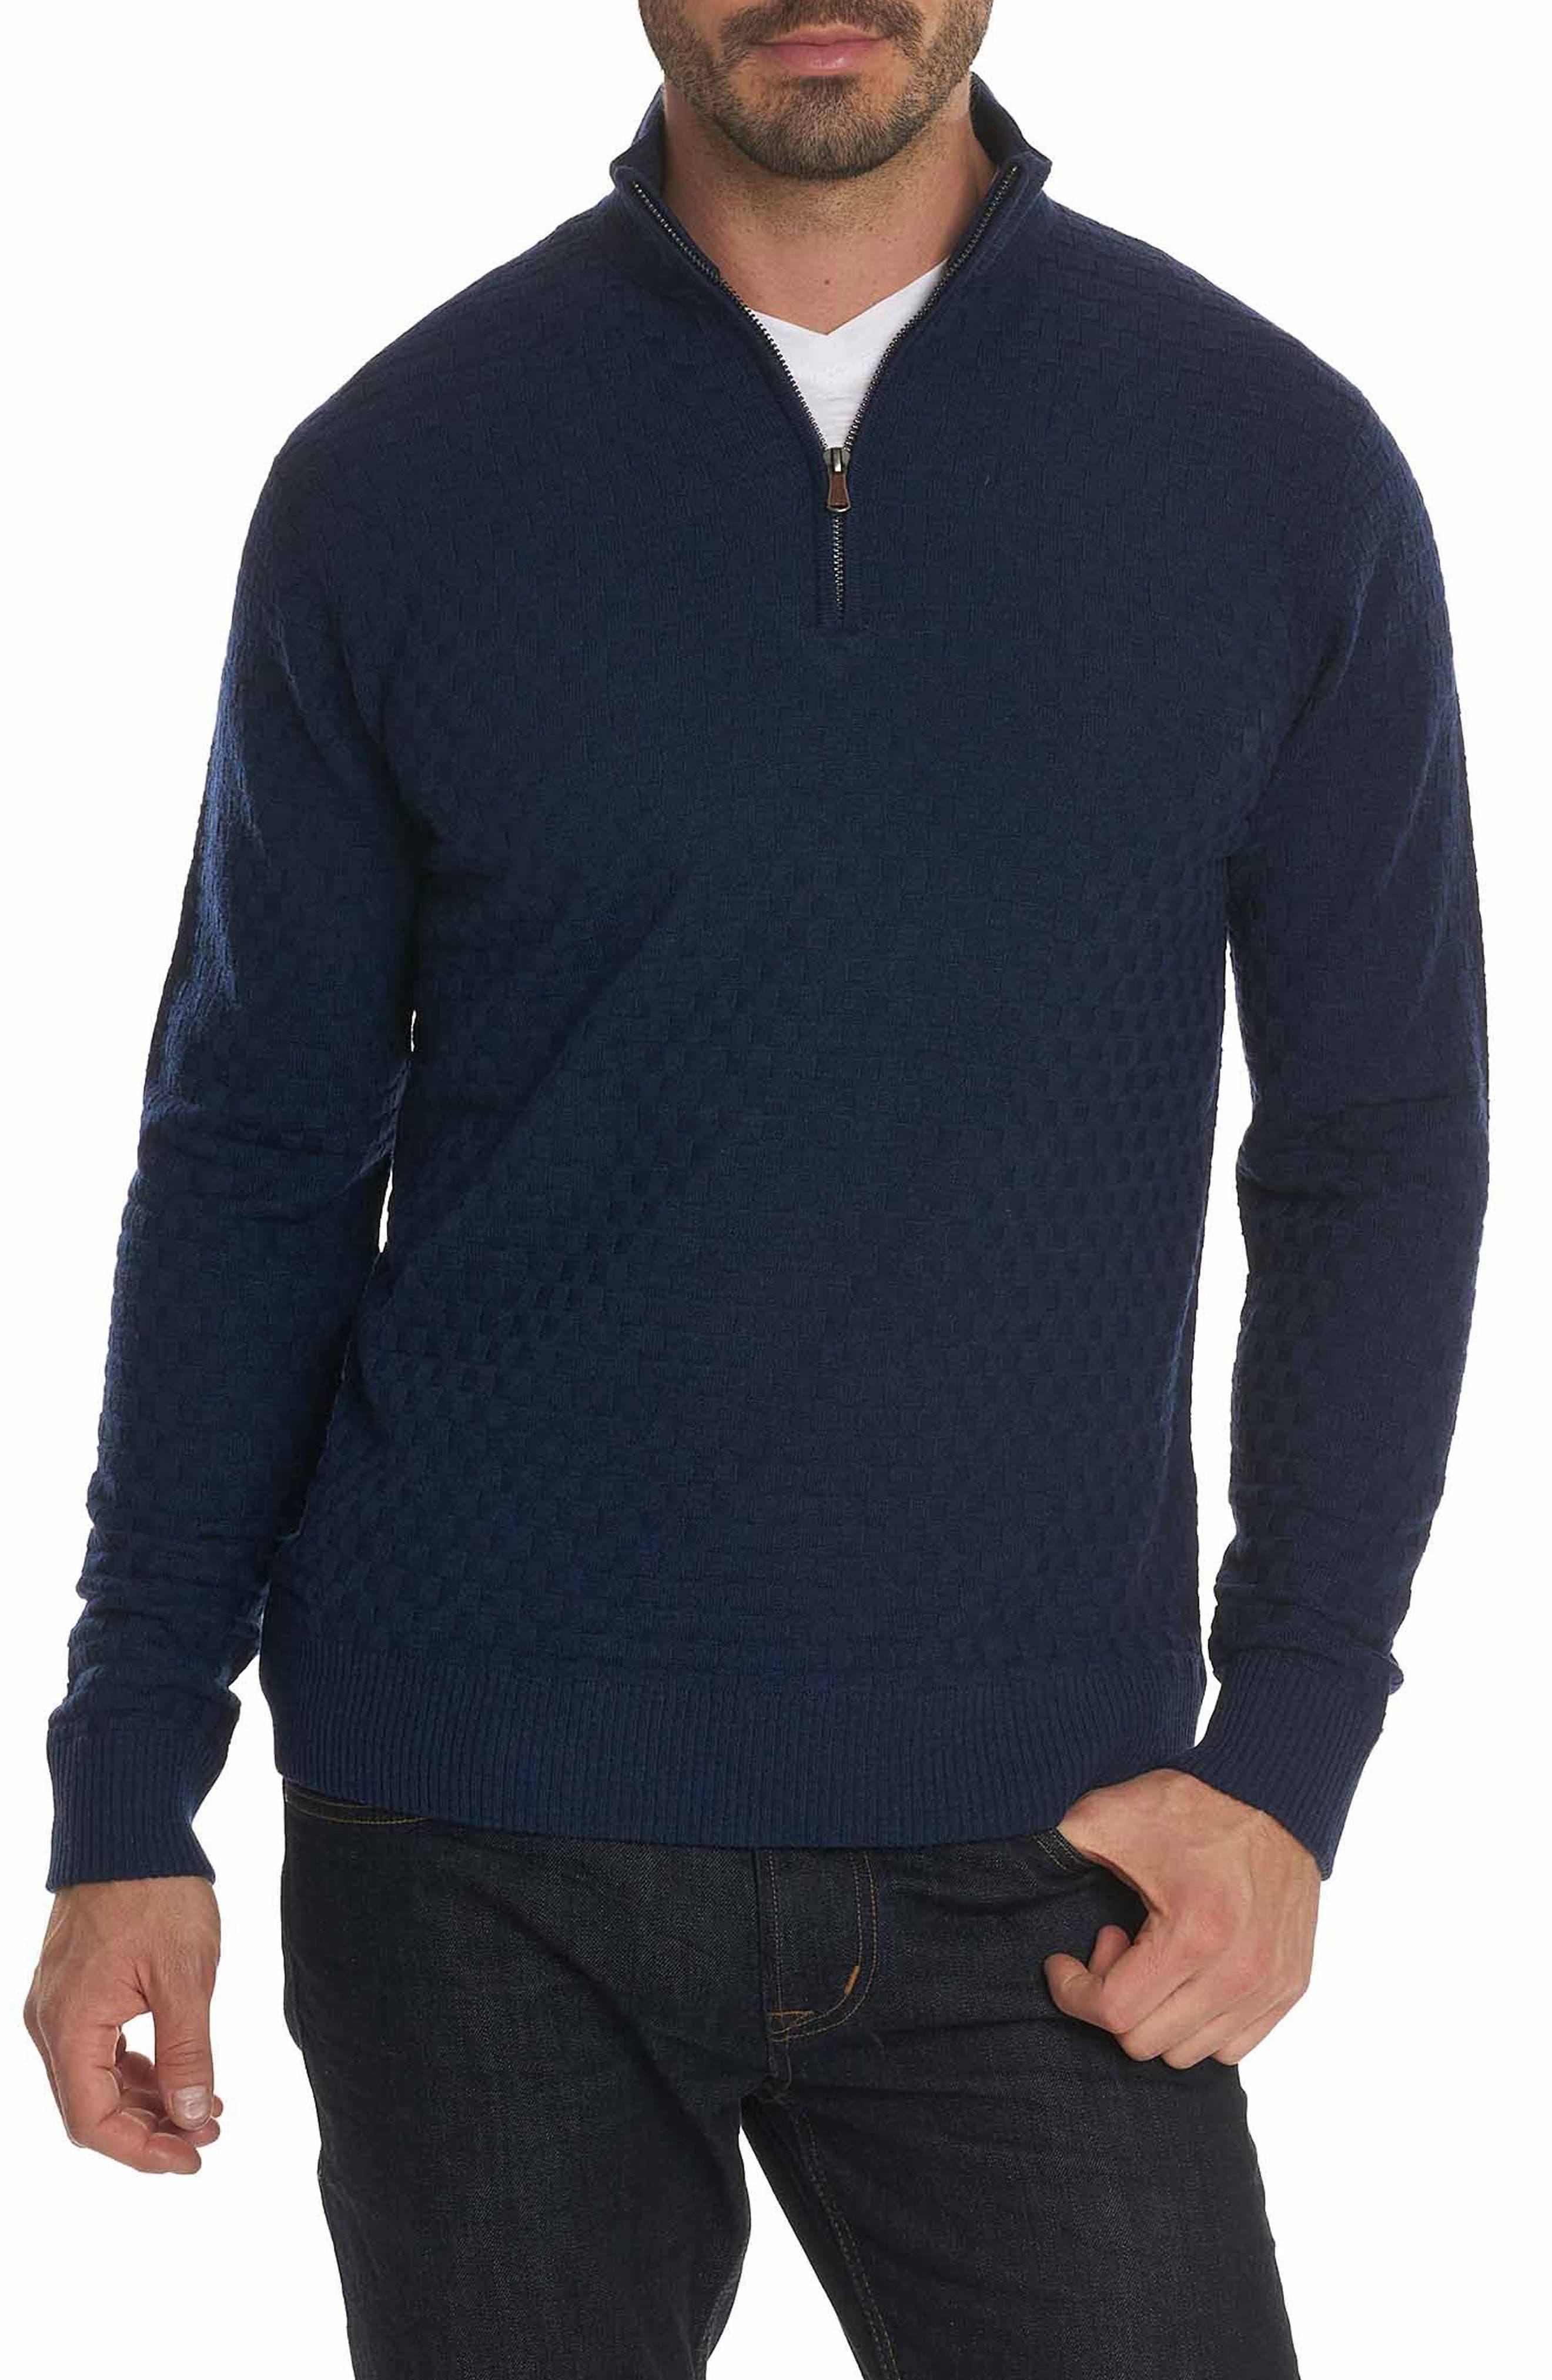 American Beech Wool Sweater,                         Main,                         color, Navy